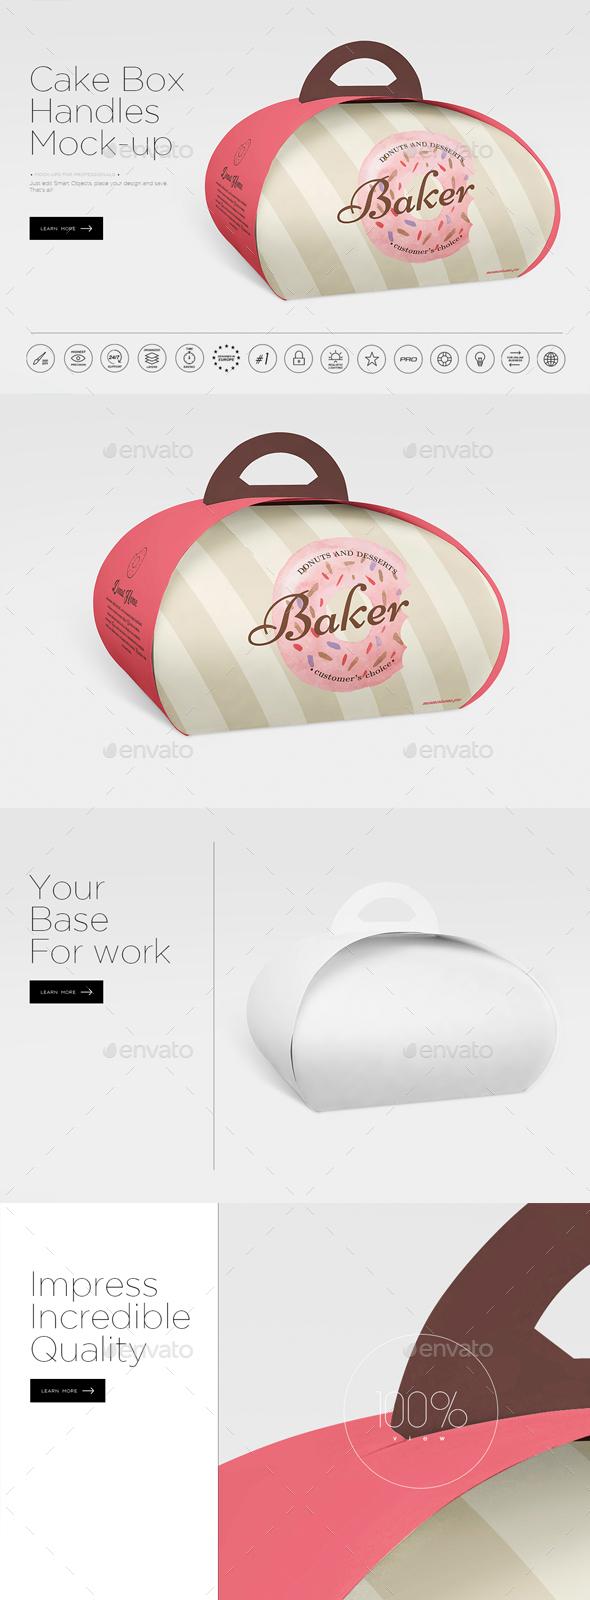 Handbag Cake Box Mock-up - Miscellaneous Product Mock-Ups